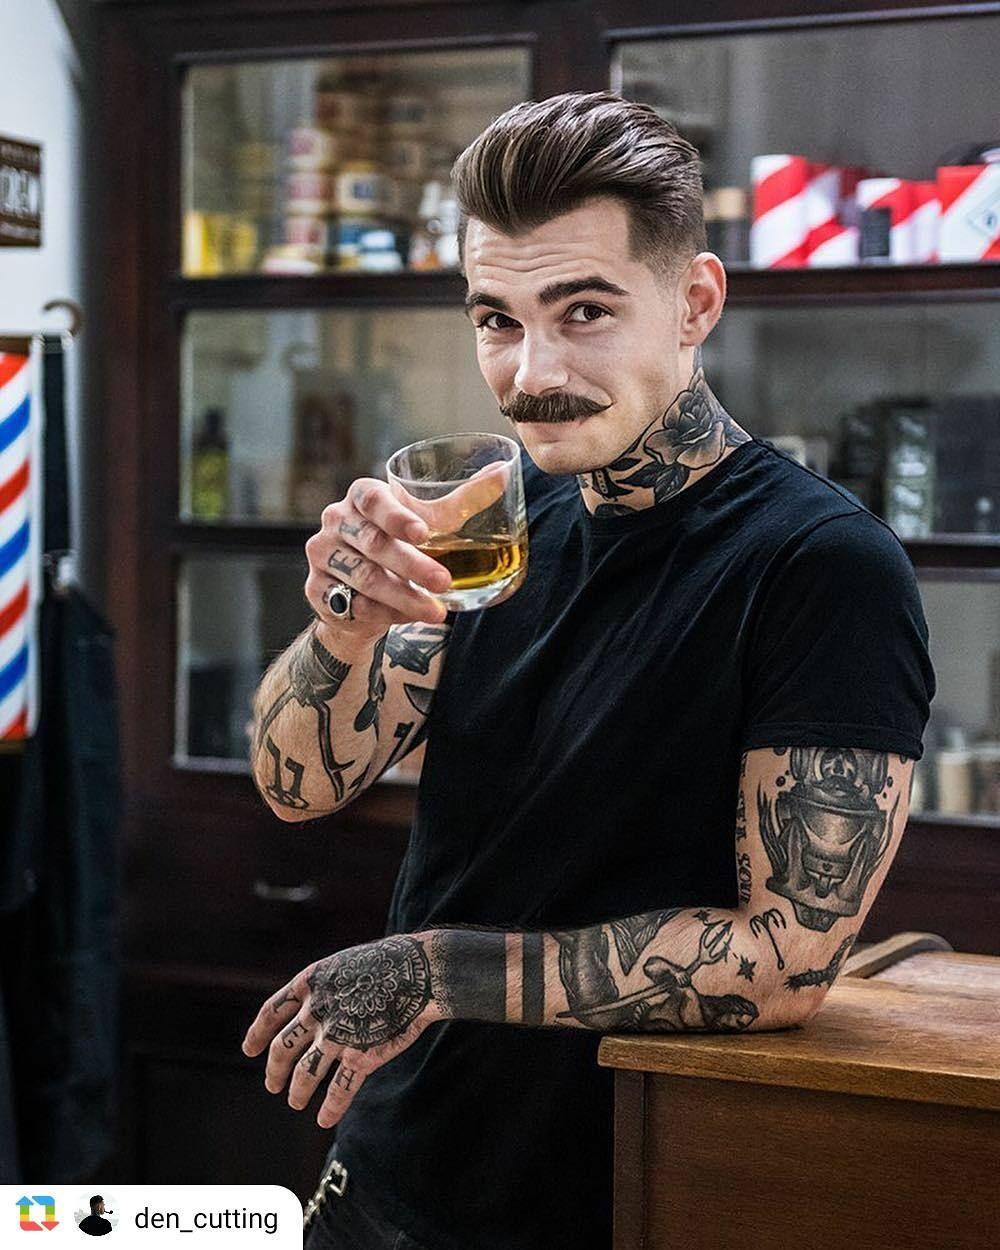 "Barbers Digest on Instagram: ""Repost @den_cutting"